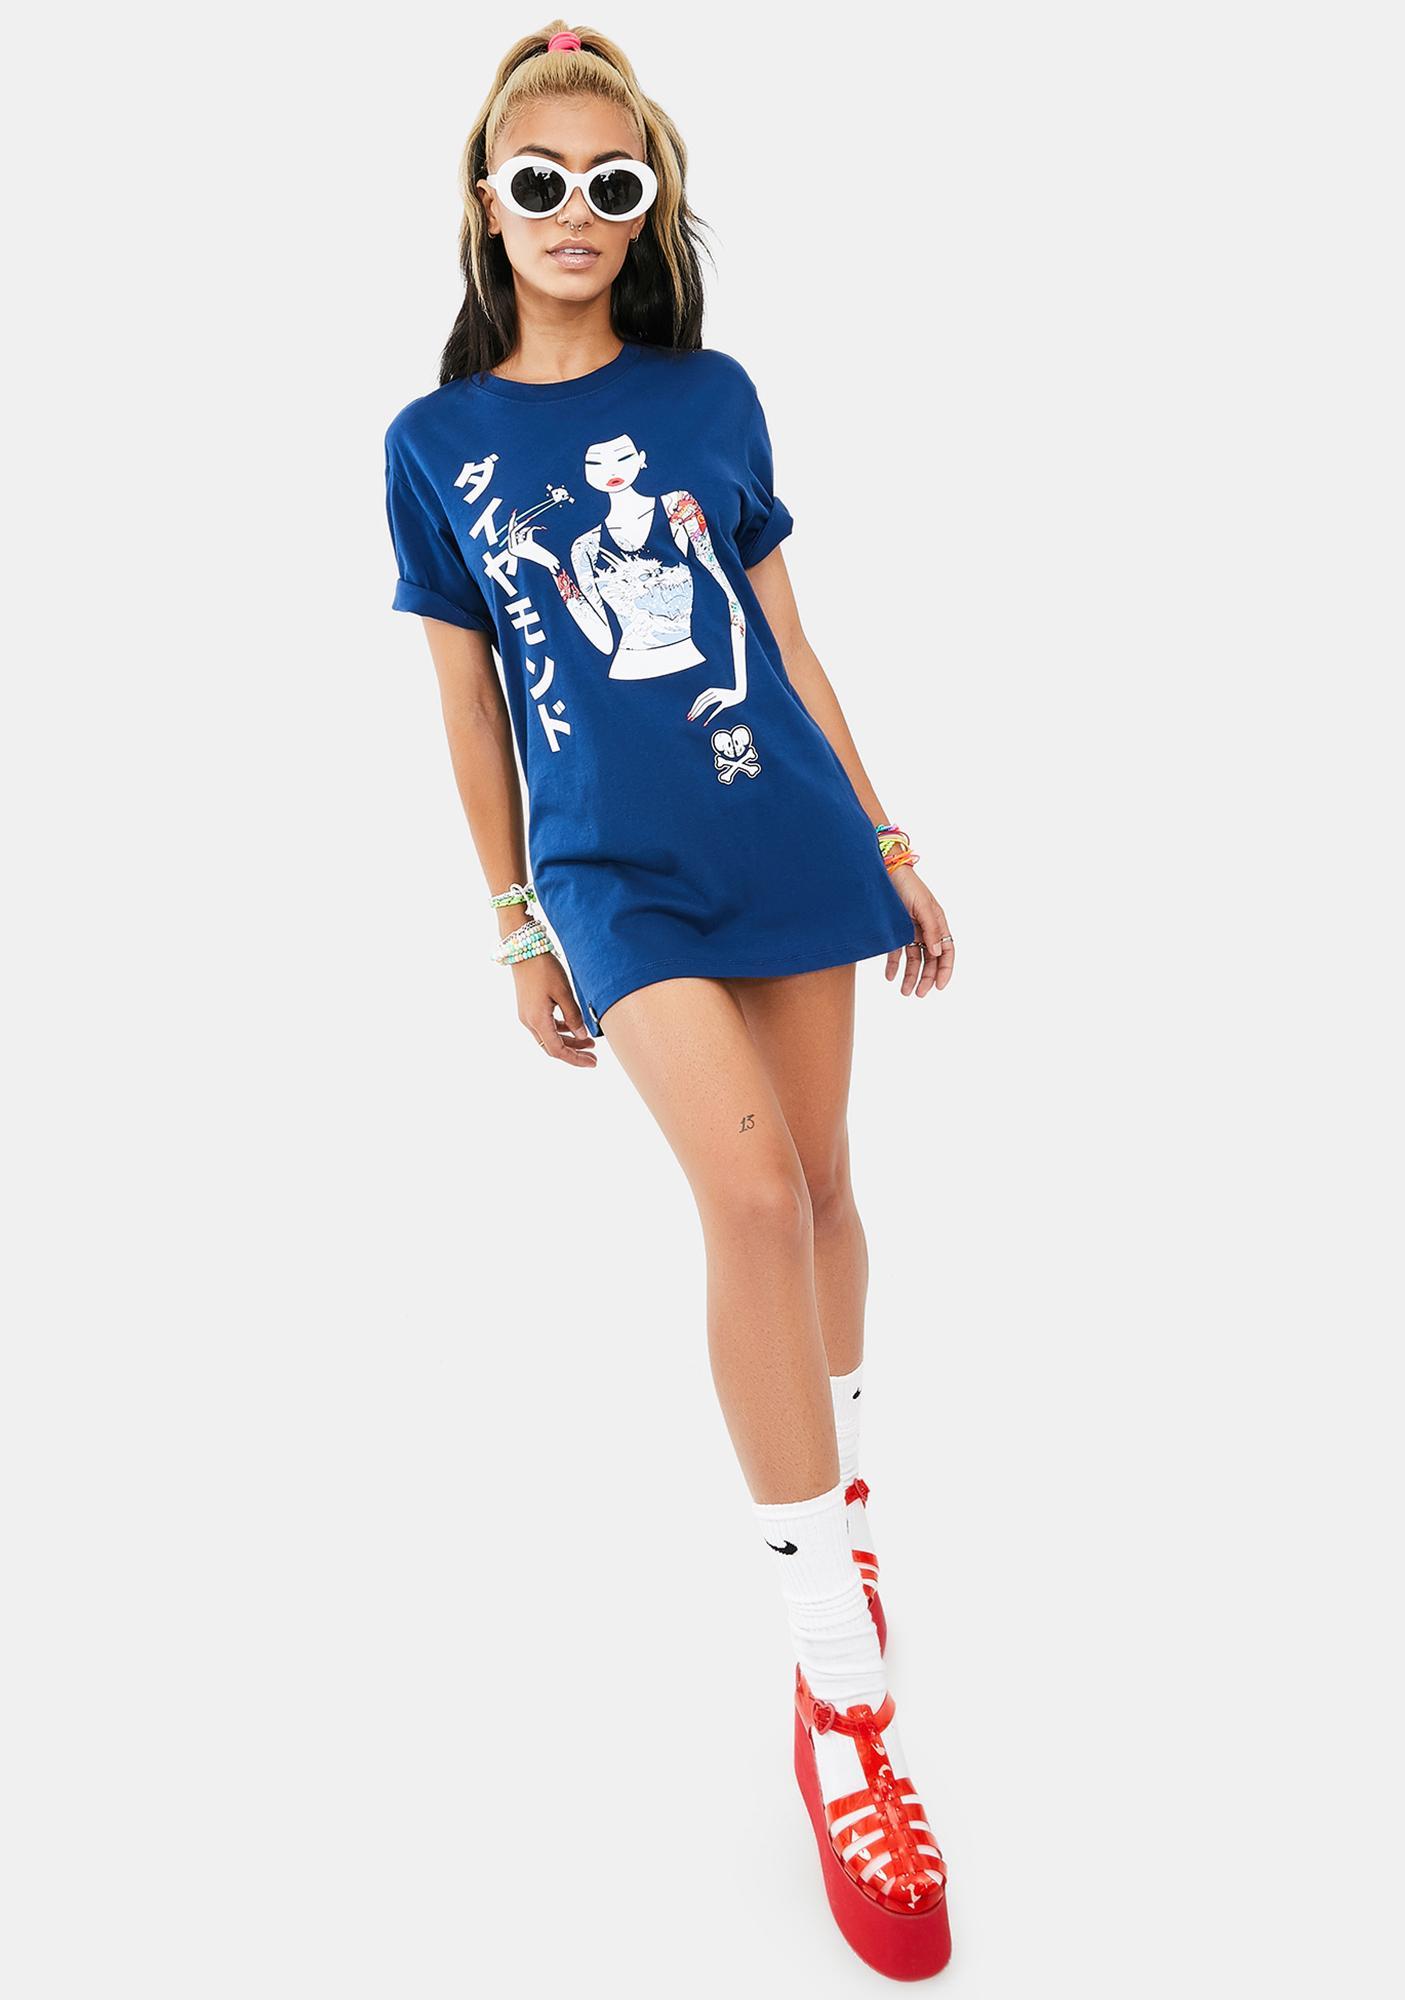 Tokidoki Japanese Diamond Girl Short Sleeve Graphic Tee